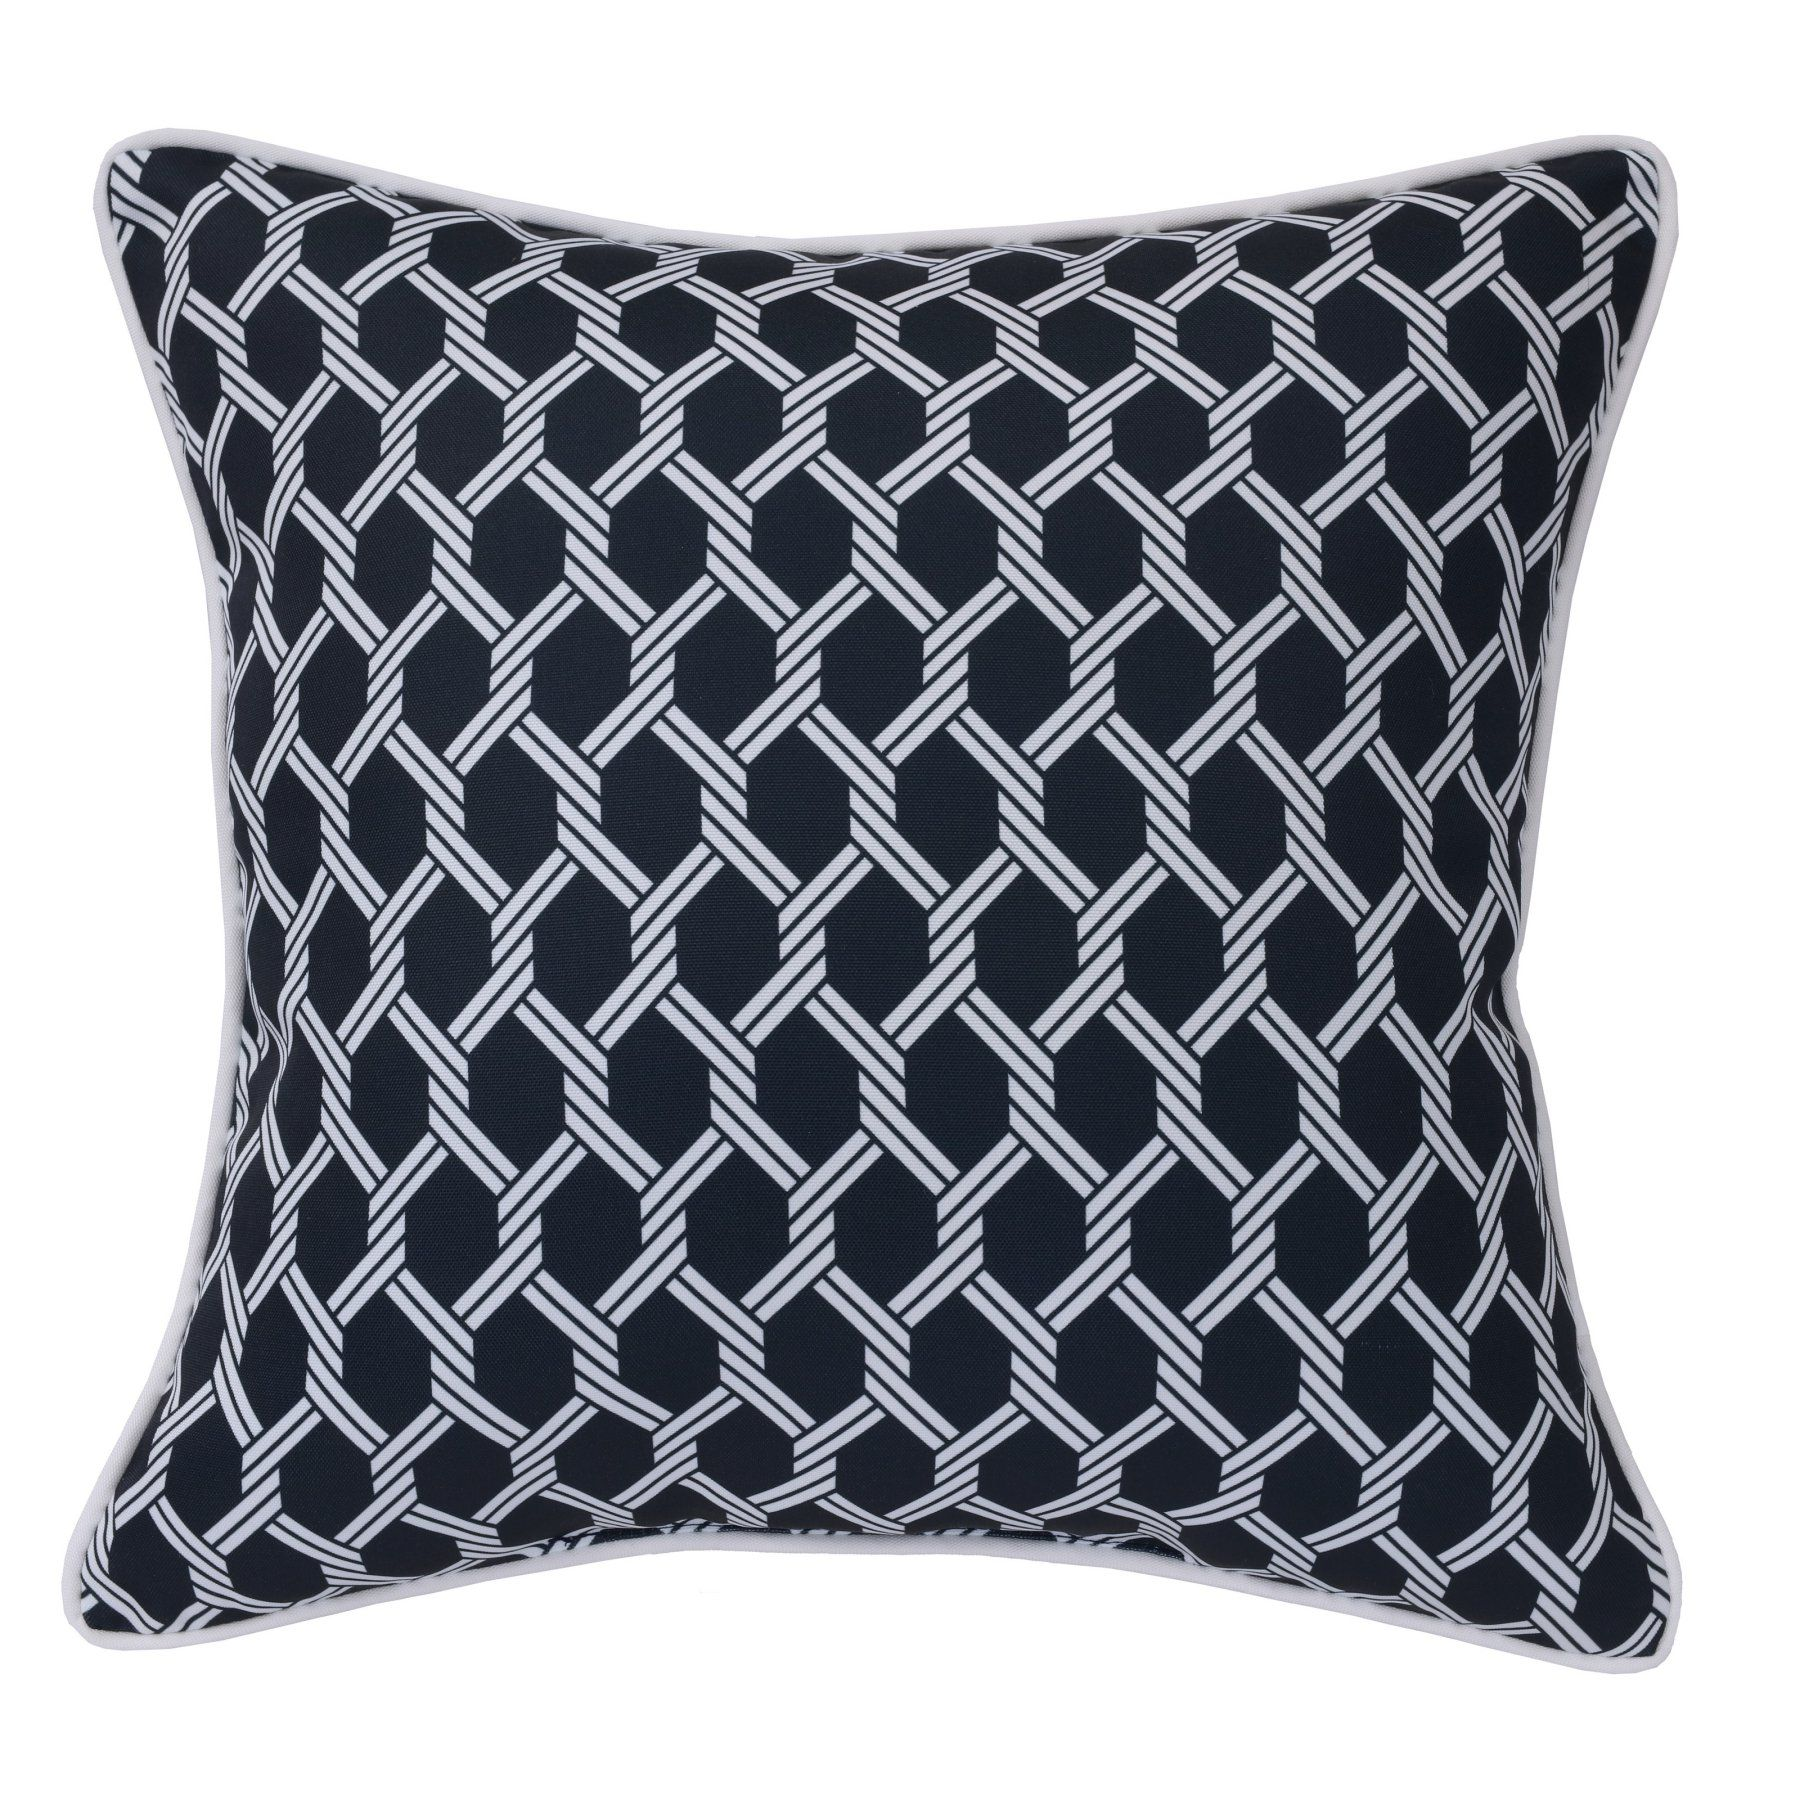 Outdoor Decor Basketweave Decorative Outdoor Throw Pillow  758101818609